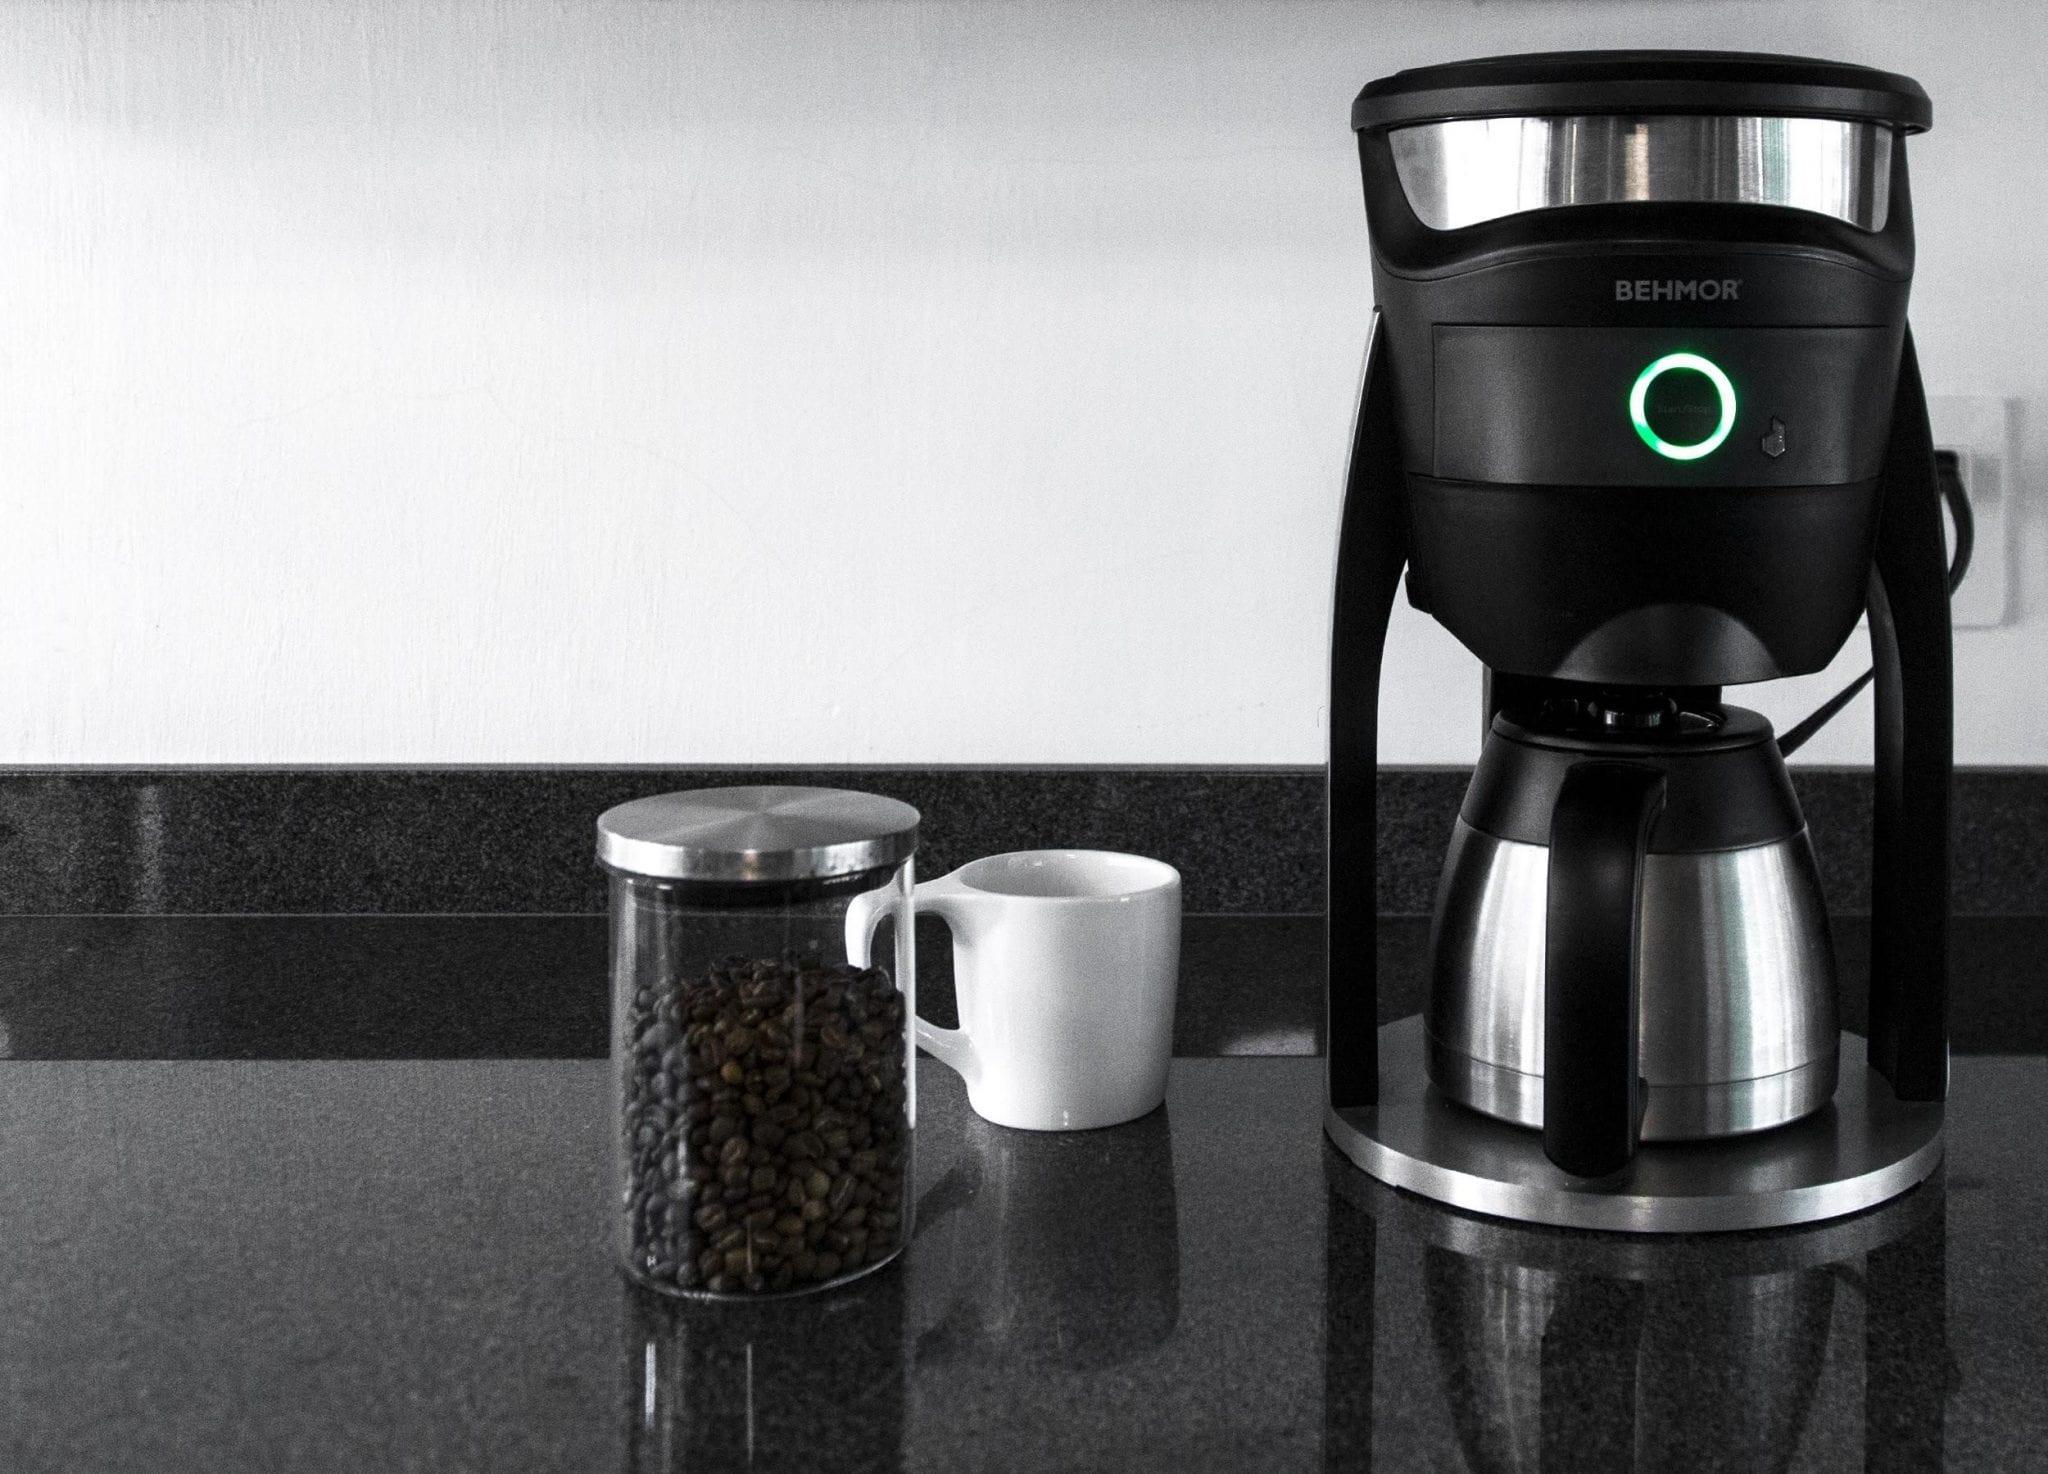 cafetera Behmor lista para usar